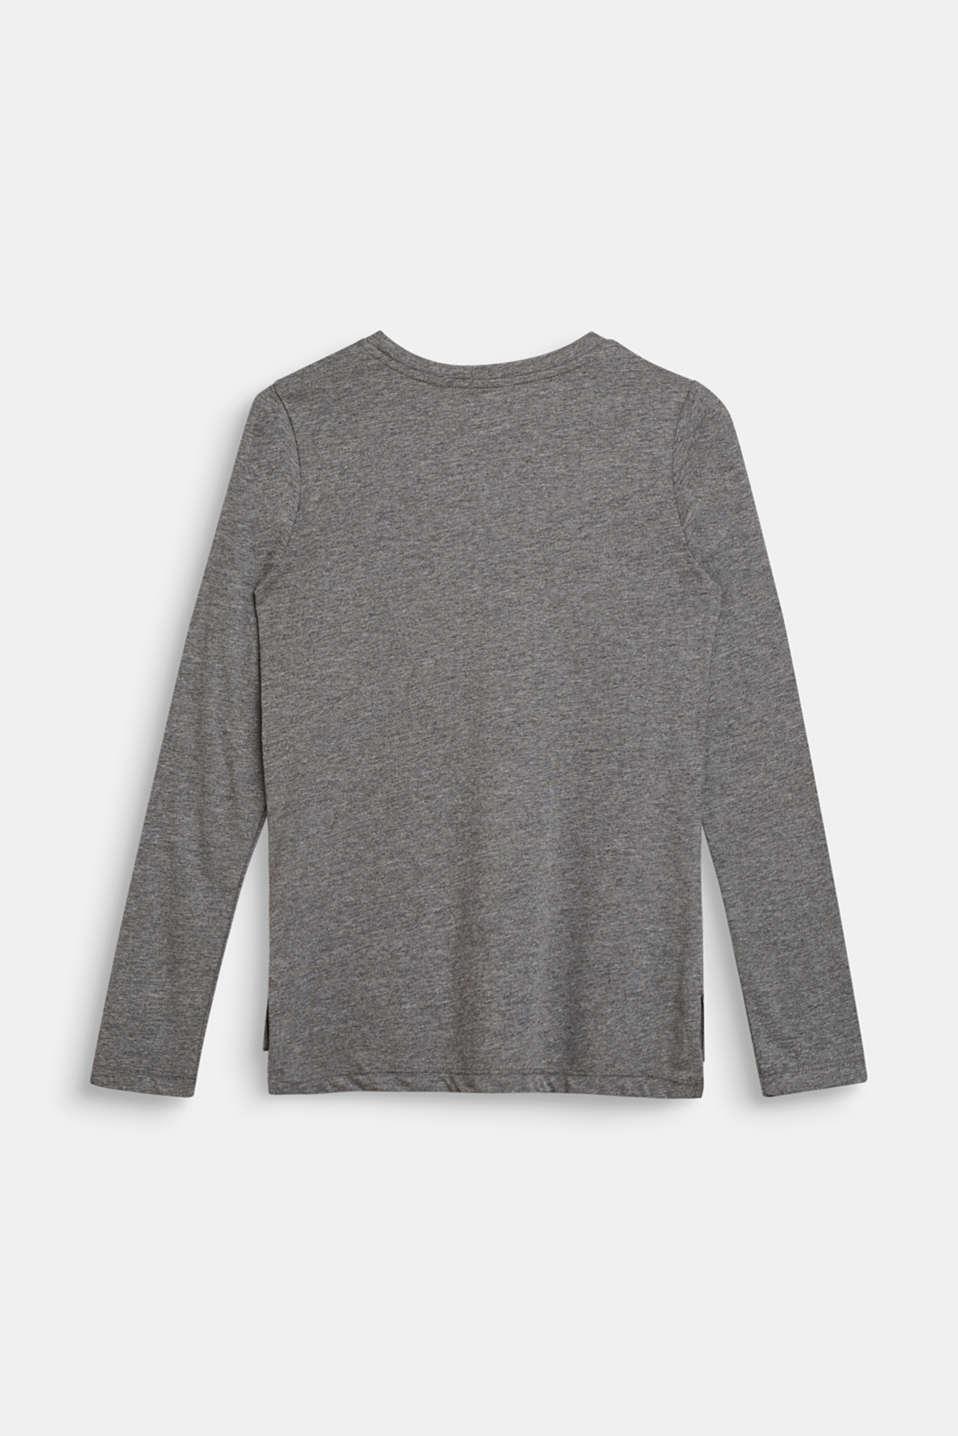 Melange long sleeve top with a foil print, LCDARK HEATHER G, detail image number 1